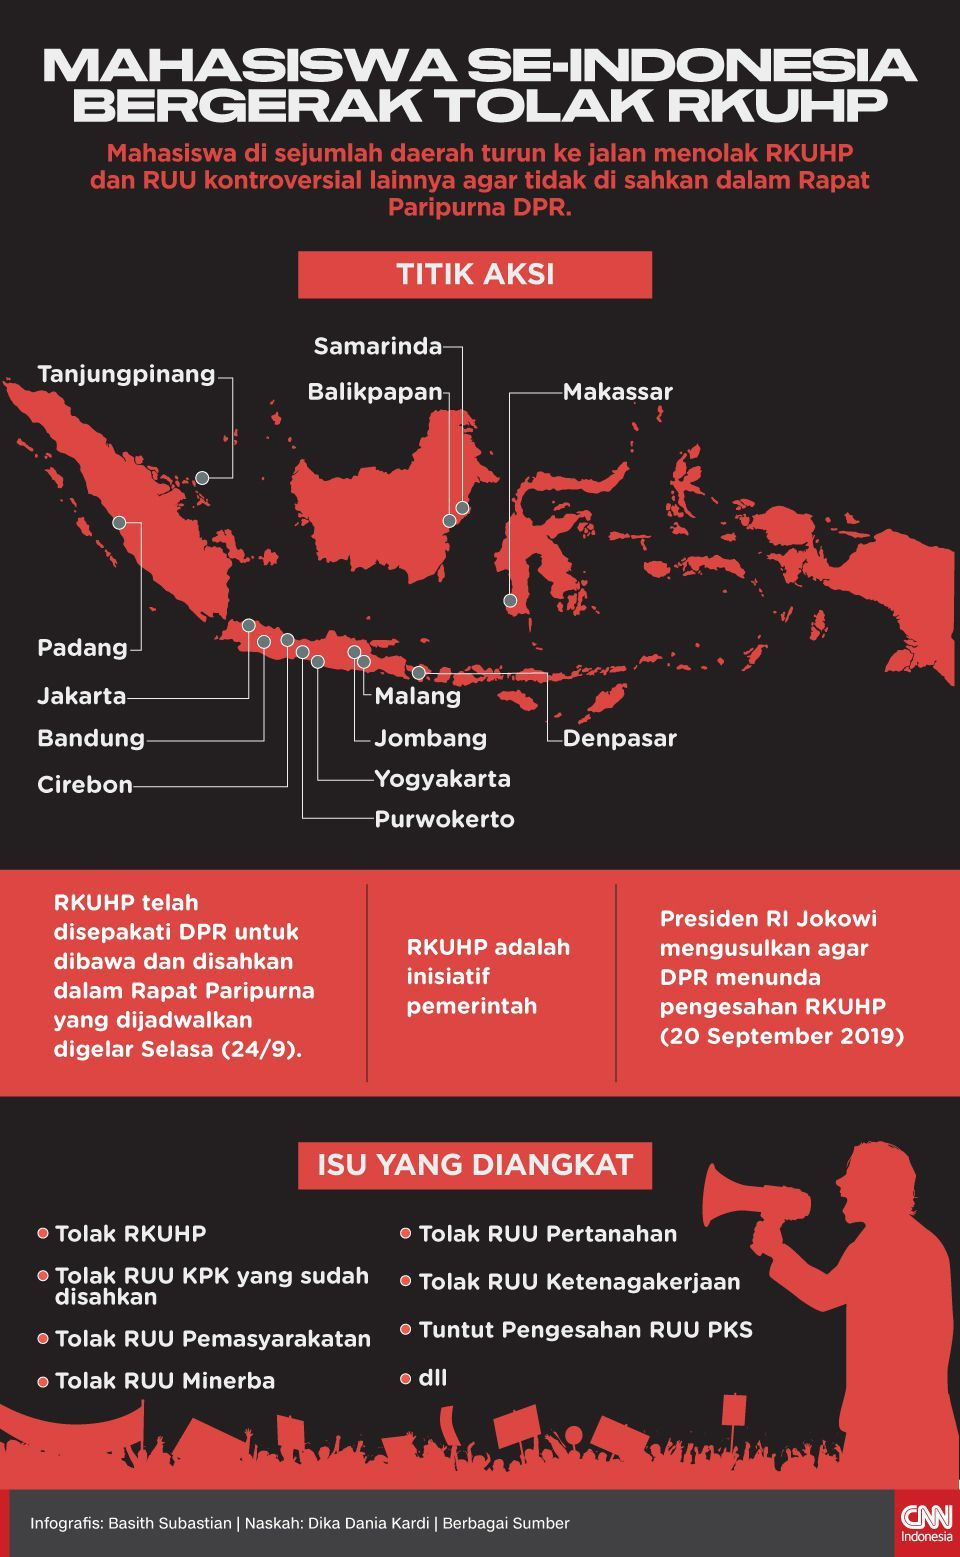 Infografis Mahasiswa Se-Indonesia Bergerak Tolak RKUHP